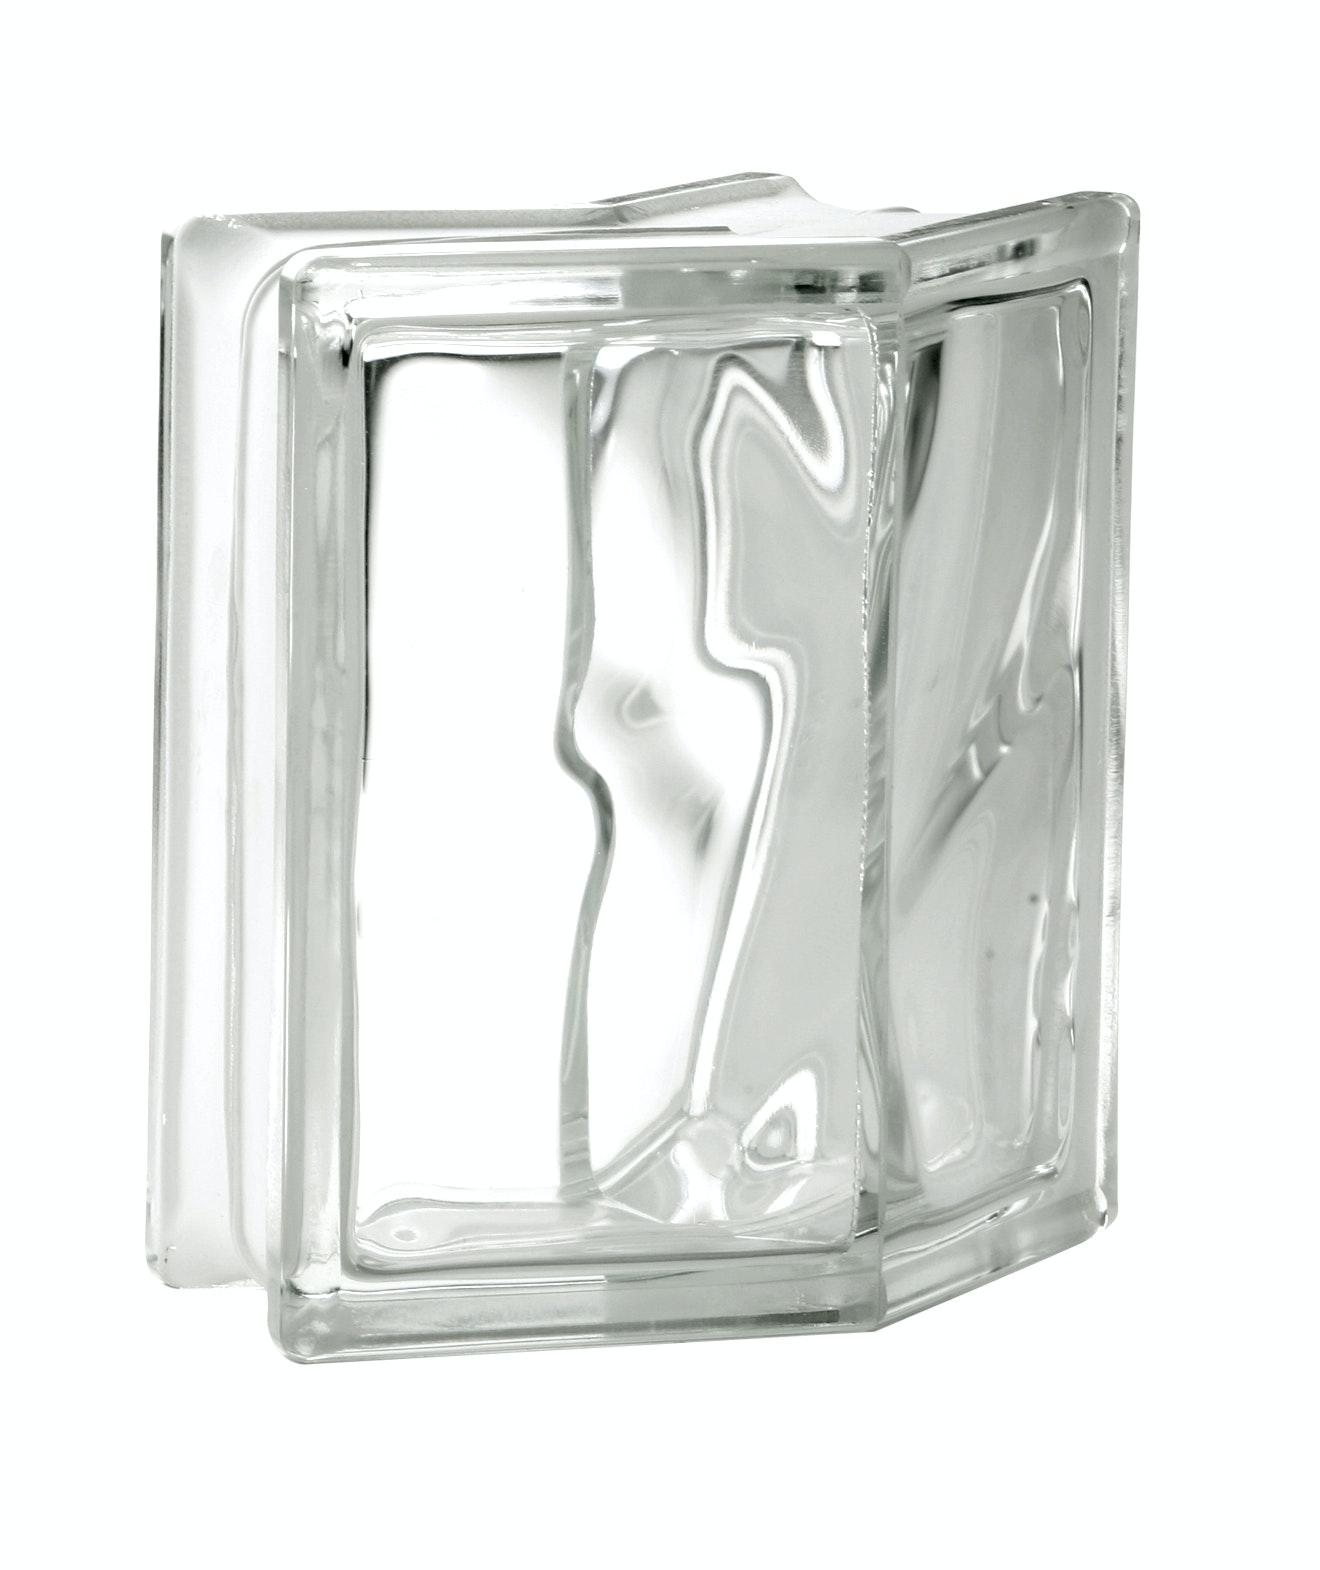 Glasblock Vetro Moln Vinklad 135 Grader